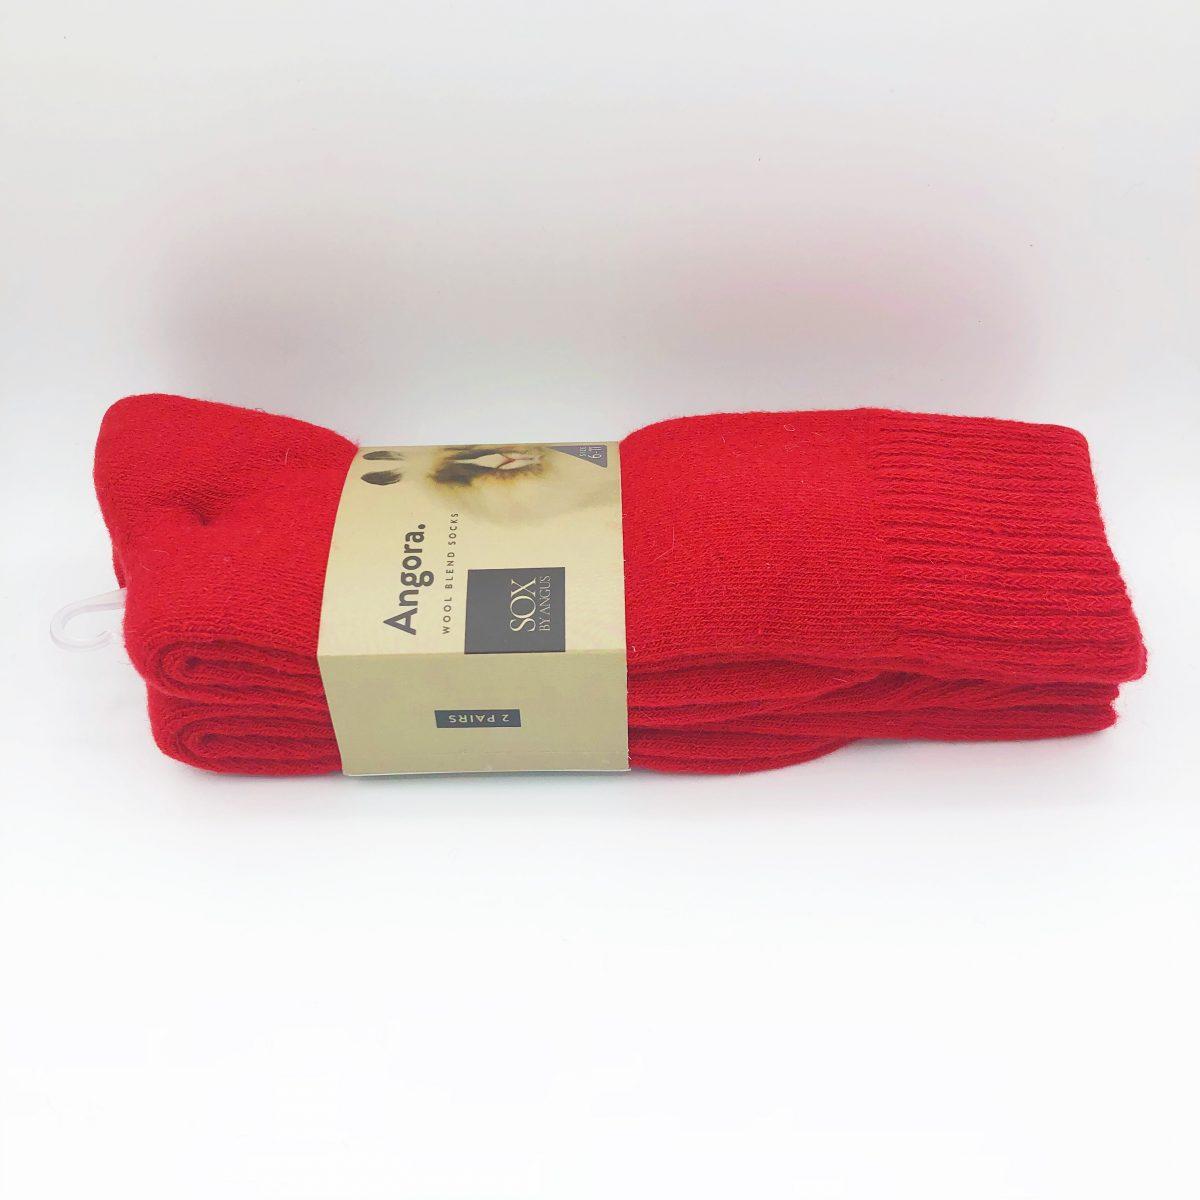 Angora Wool Blend Socks 2 Pair Pack - Red